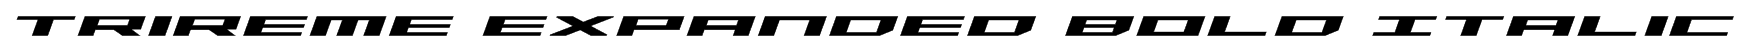 Trireme Expanded Bold Italic Font